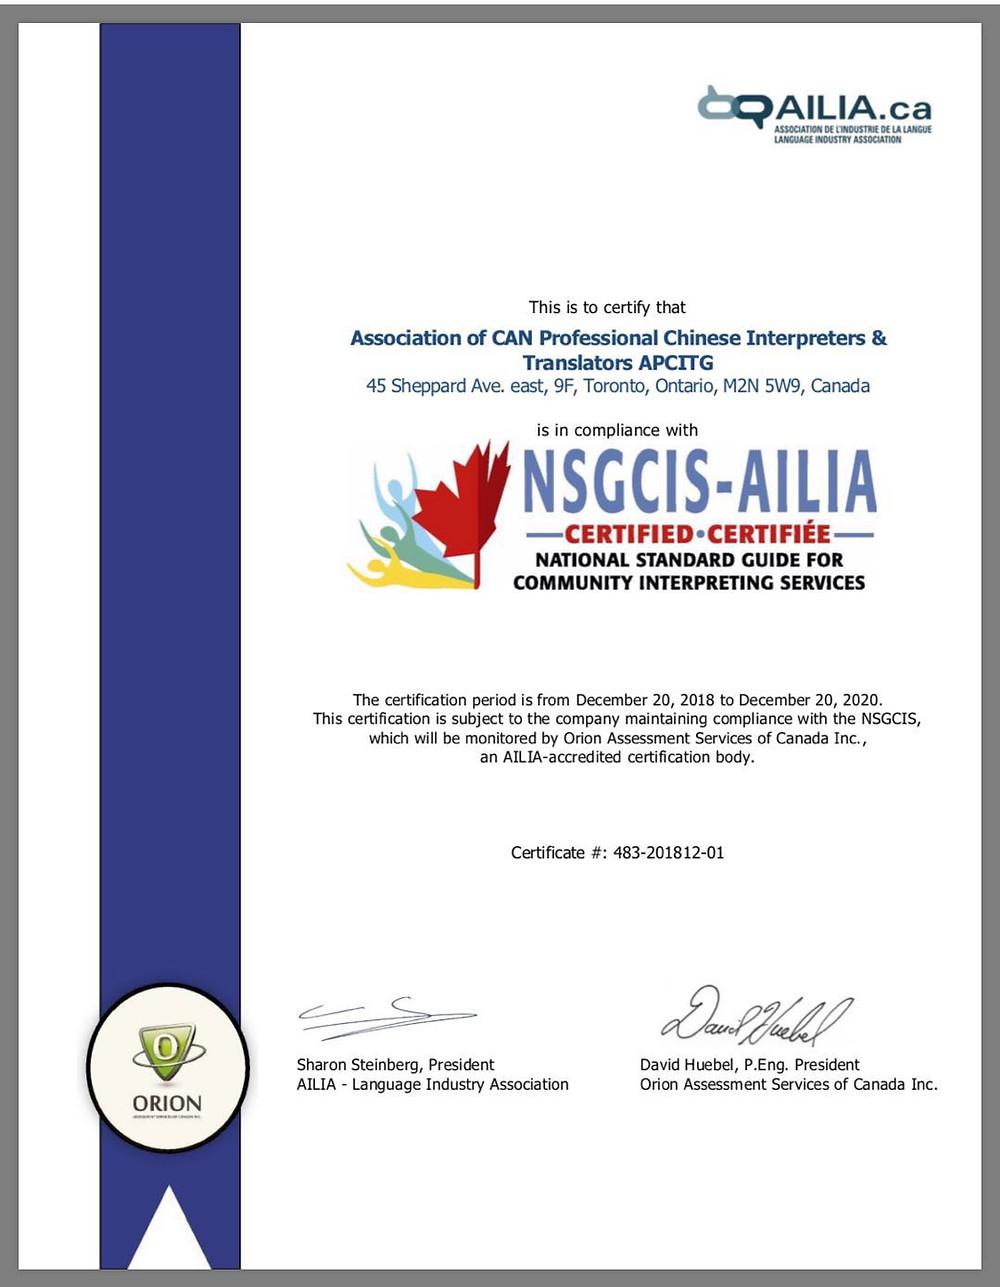 NSGCIS Certification